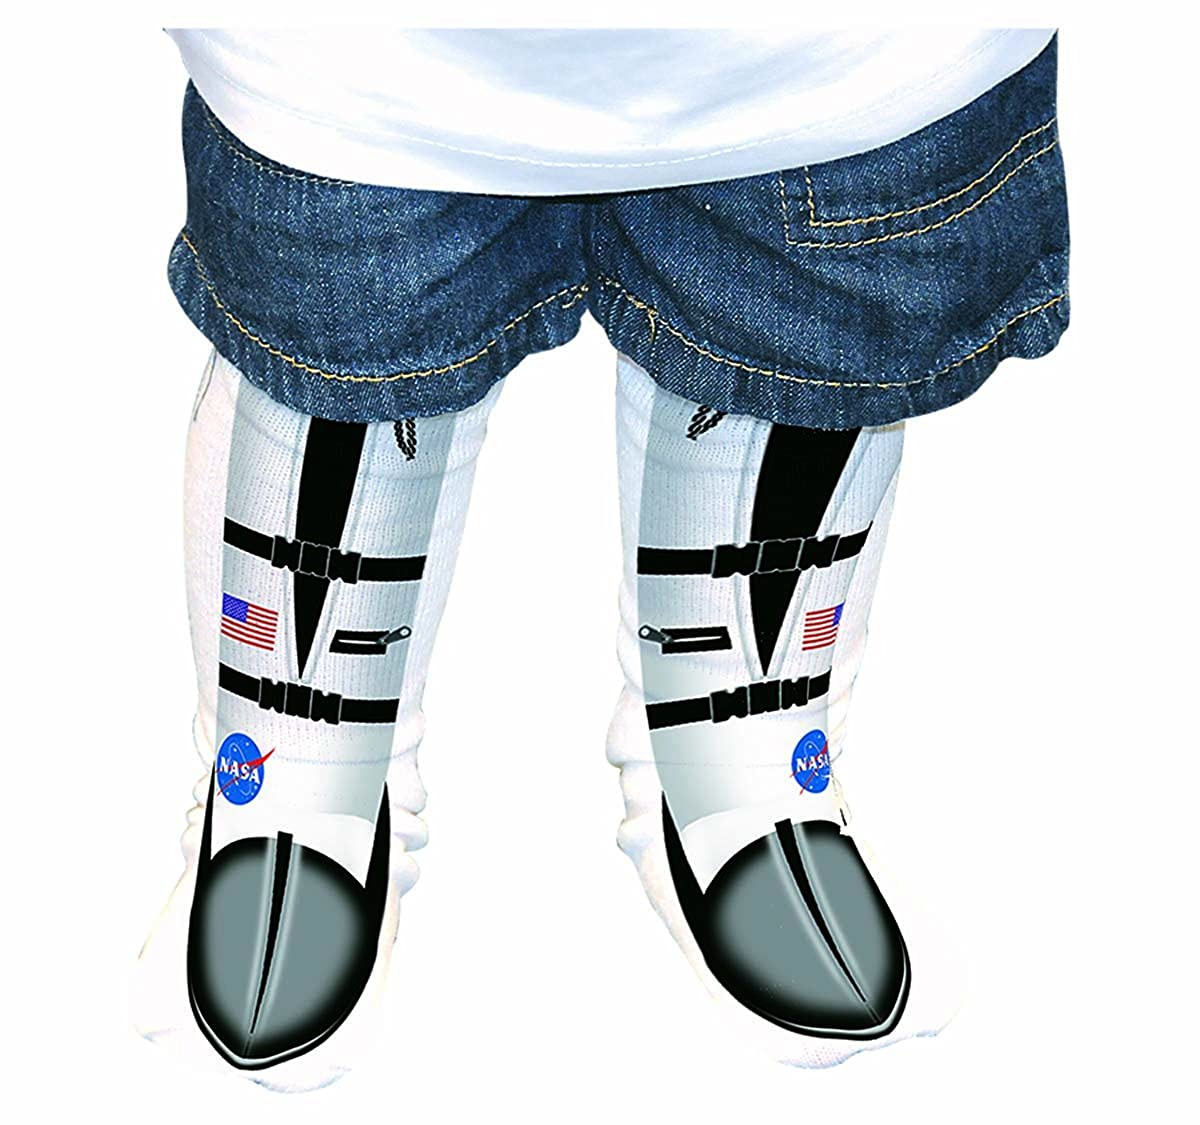 Astronaut Boots Socks 7028-2-4-b